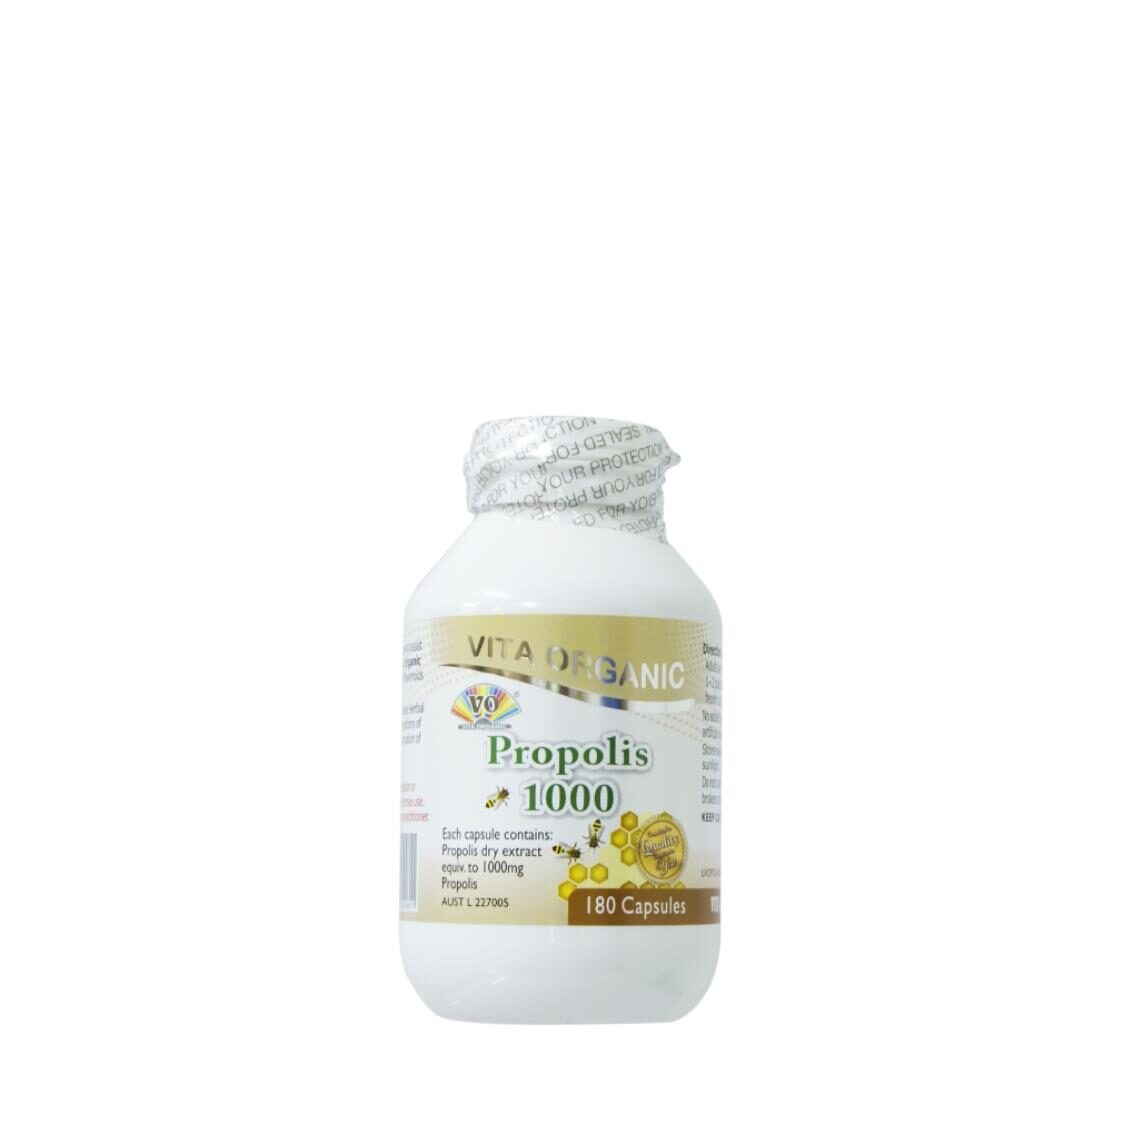 Vita Organic Propolis 1000 180 Capsules